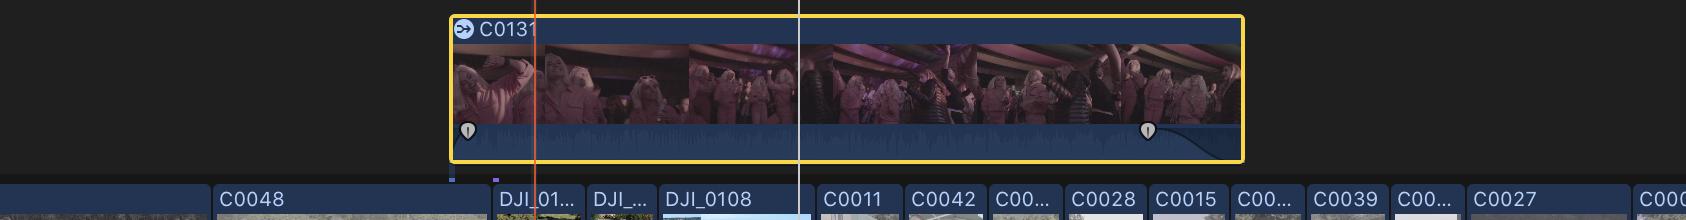 Custom FCPX Keyboard Shortcut: Option+Z — Set Volume to Silence